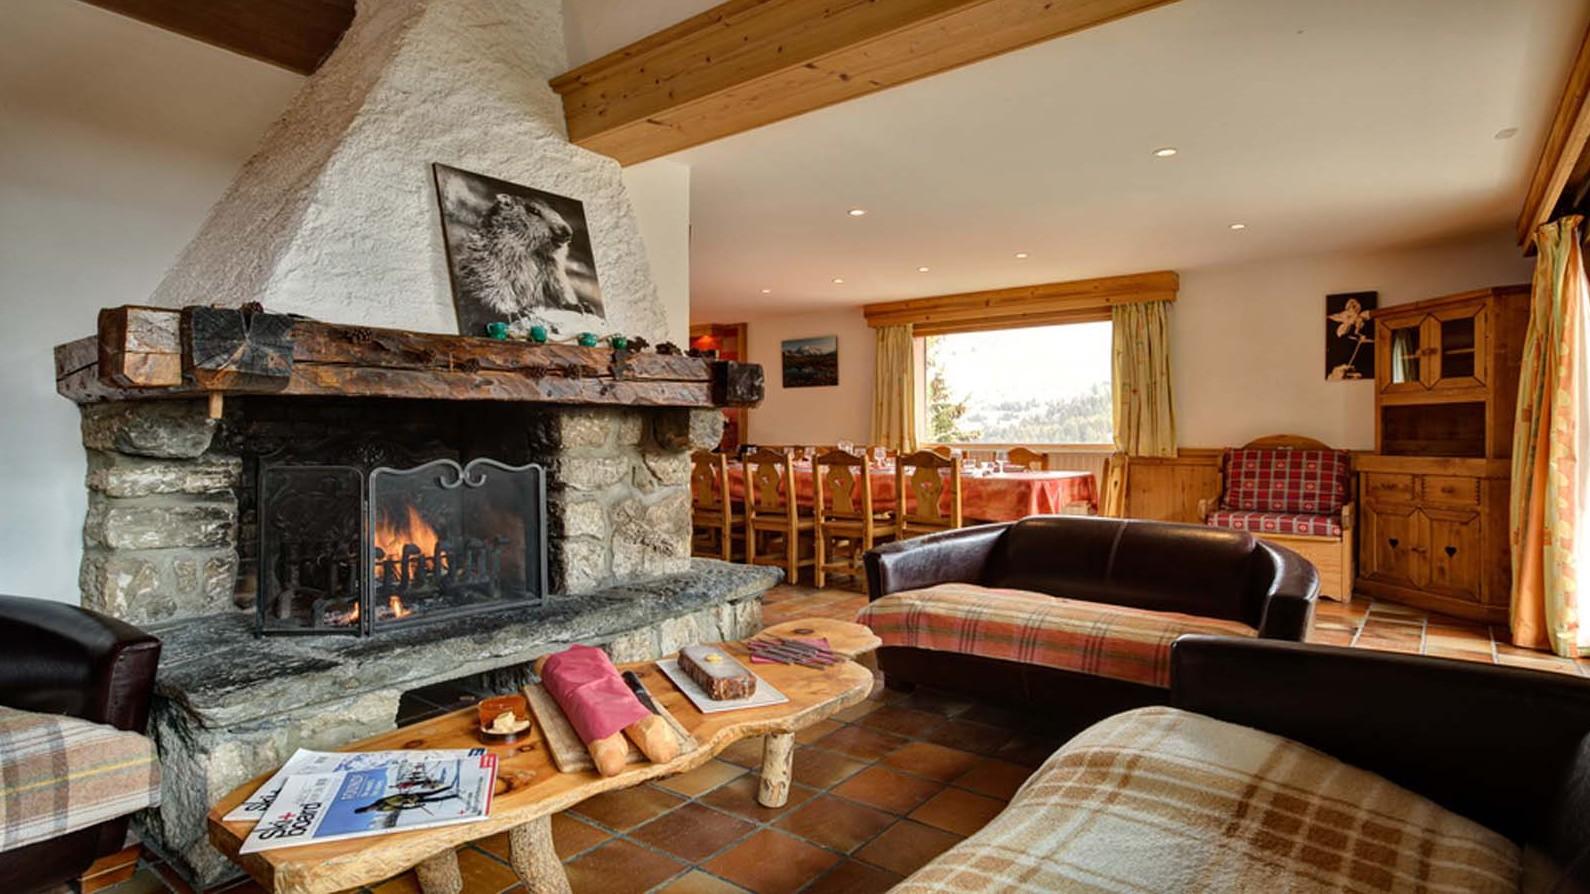 Lounge, Chalet Elodie - ski chalet in Meribel, France